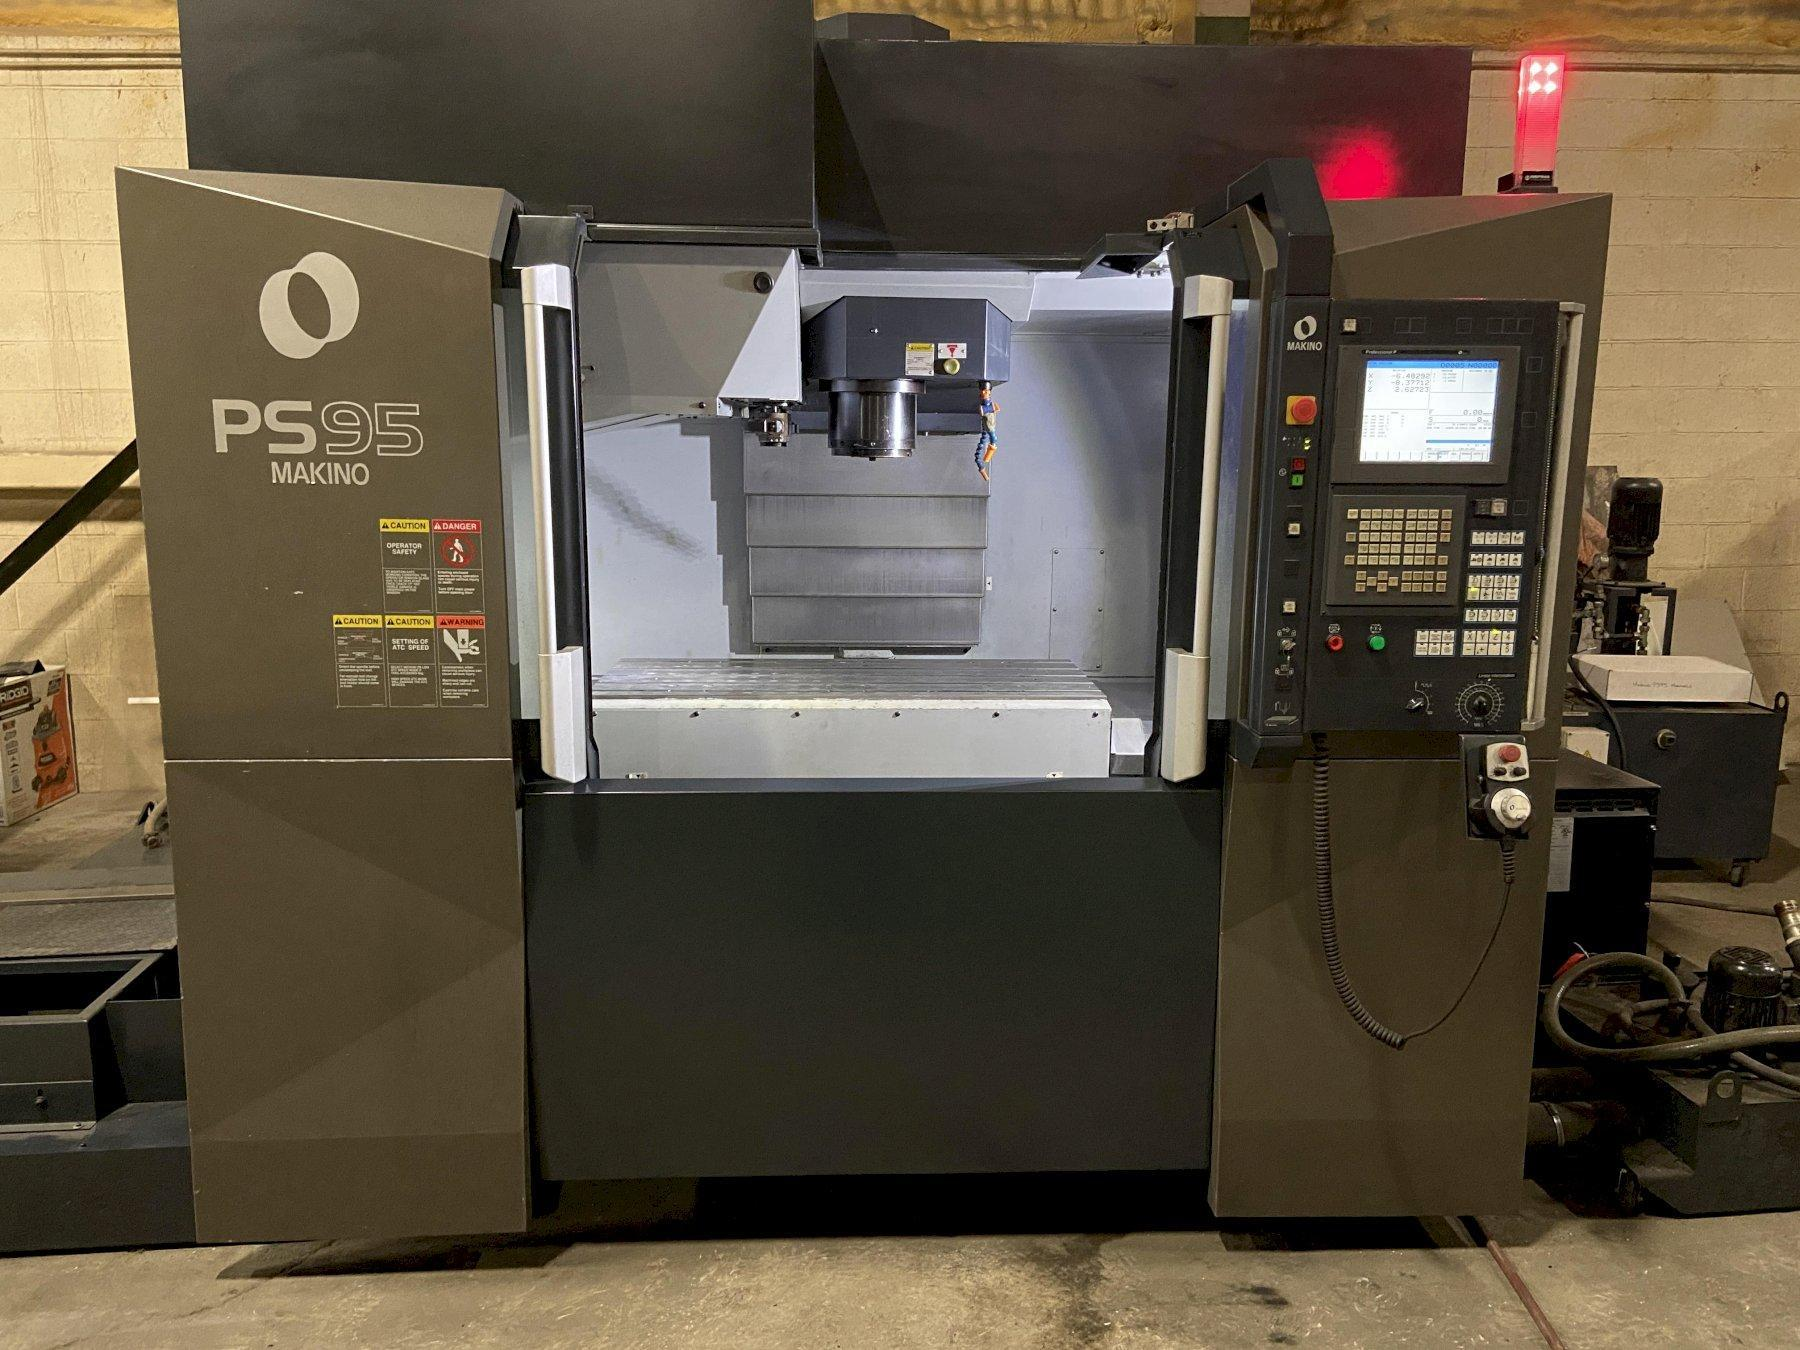 Makino PS95 CNC Vertical Machining Center, Fanuc Pro P Control, 36